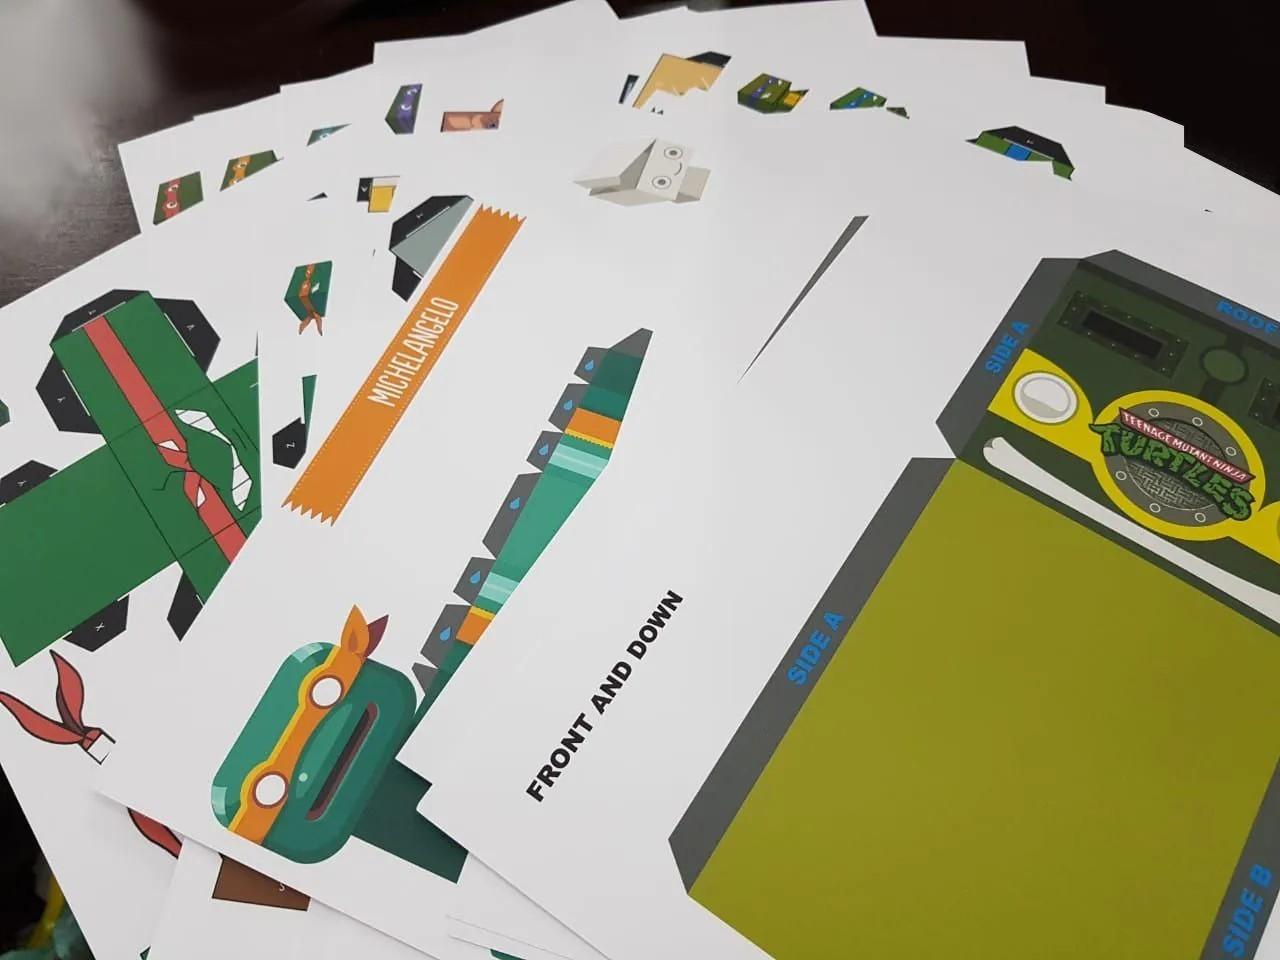 Kit Com 25 Papercraft Tmnt Tartaruga Ninja Dobradura Origami